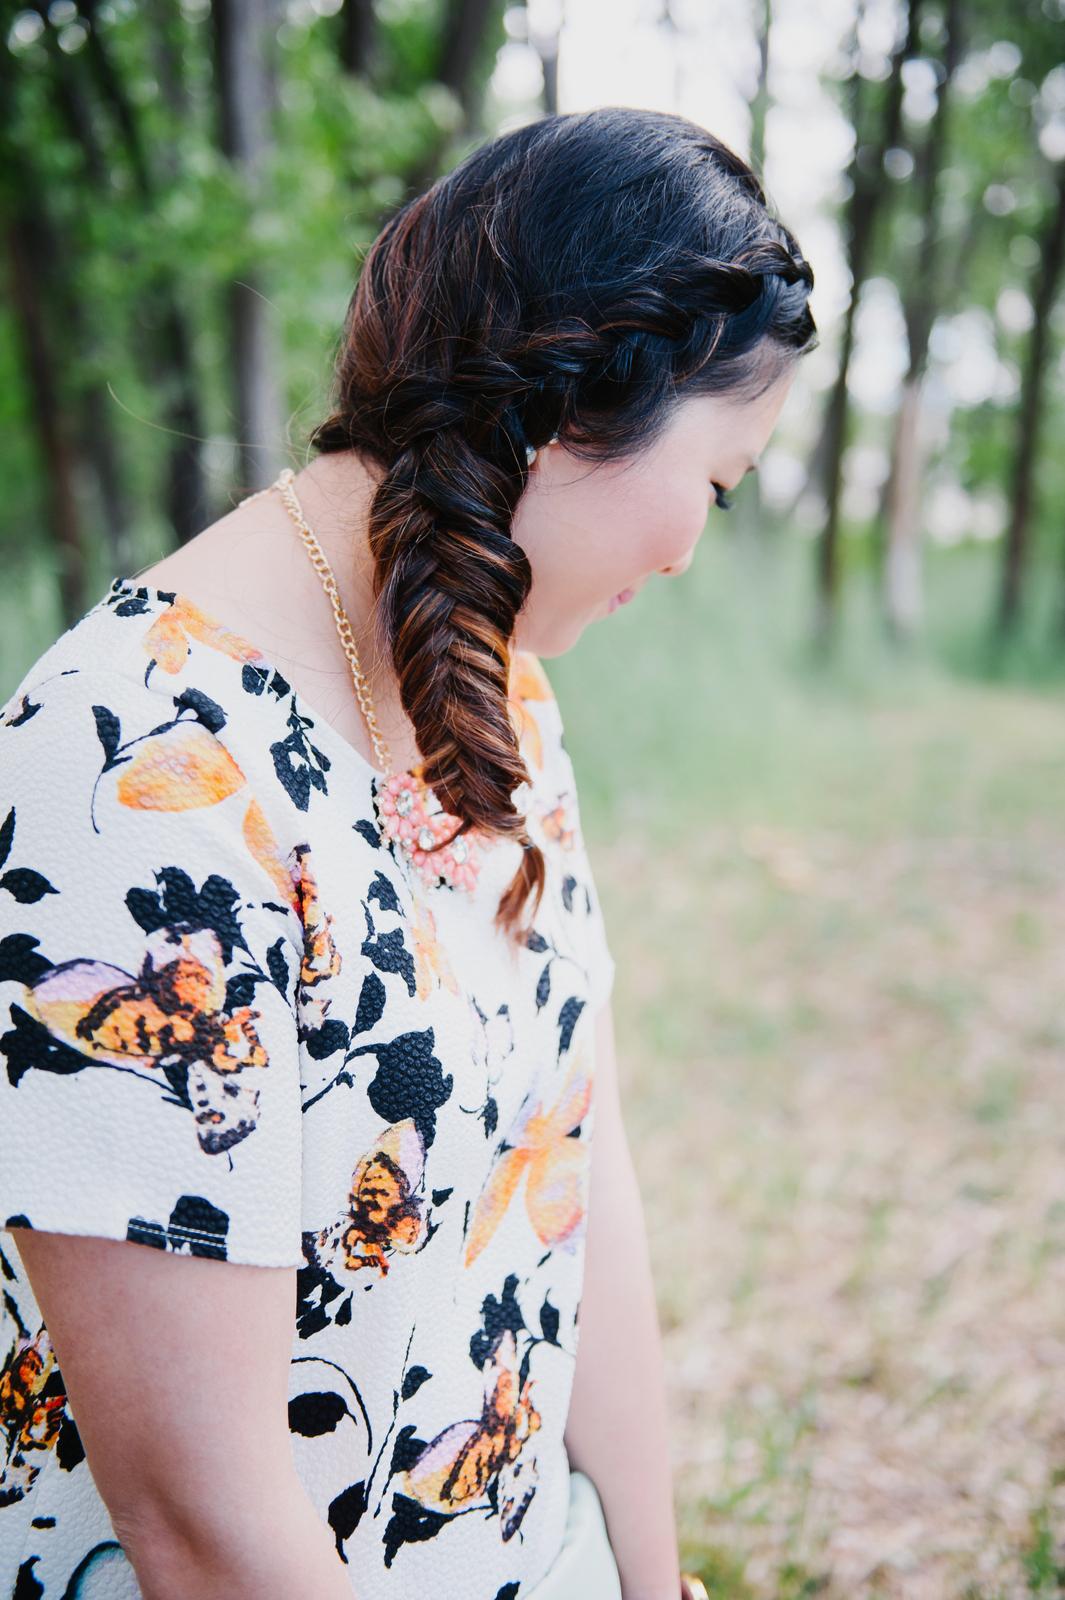 Sandy a la Mode | Fashion Blogger Braid Hairstyle Fishtail Braid